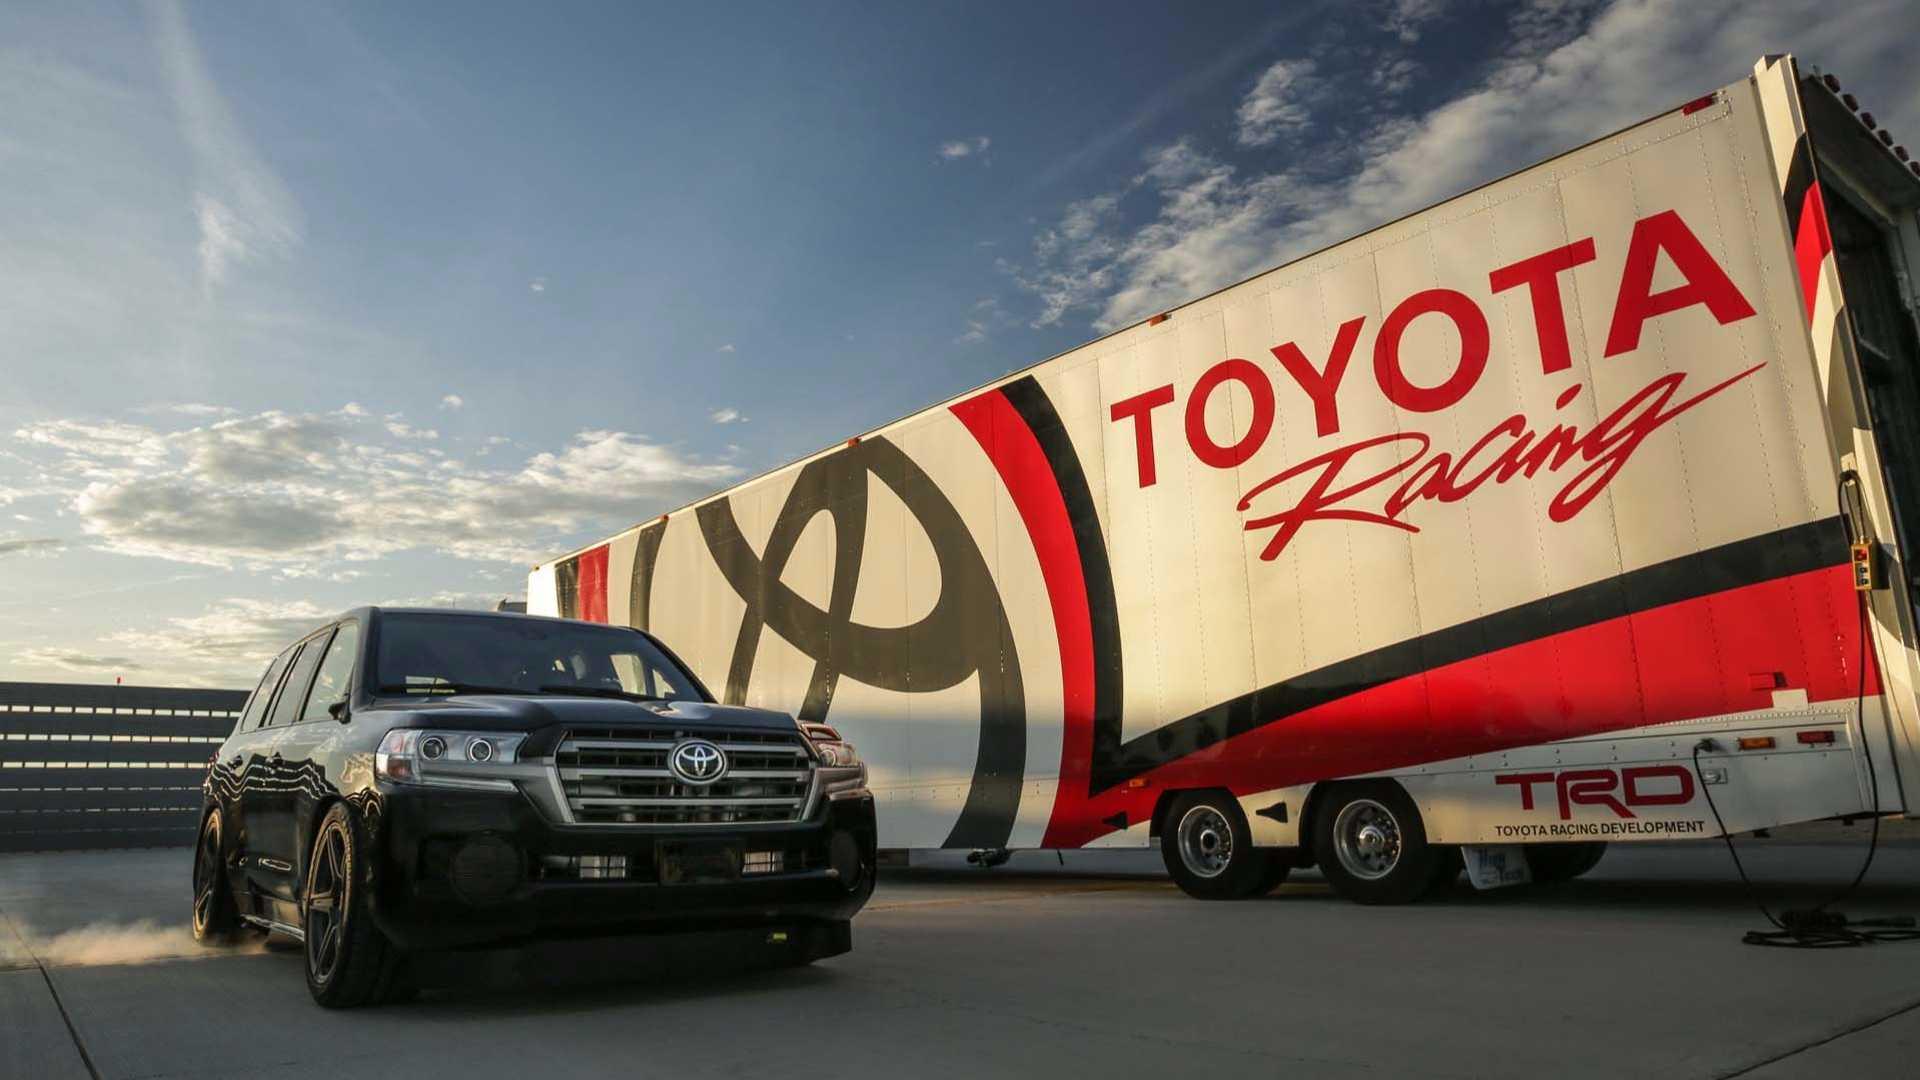 Toyota_Land_Cruiser_Speed_Record_07